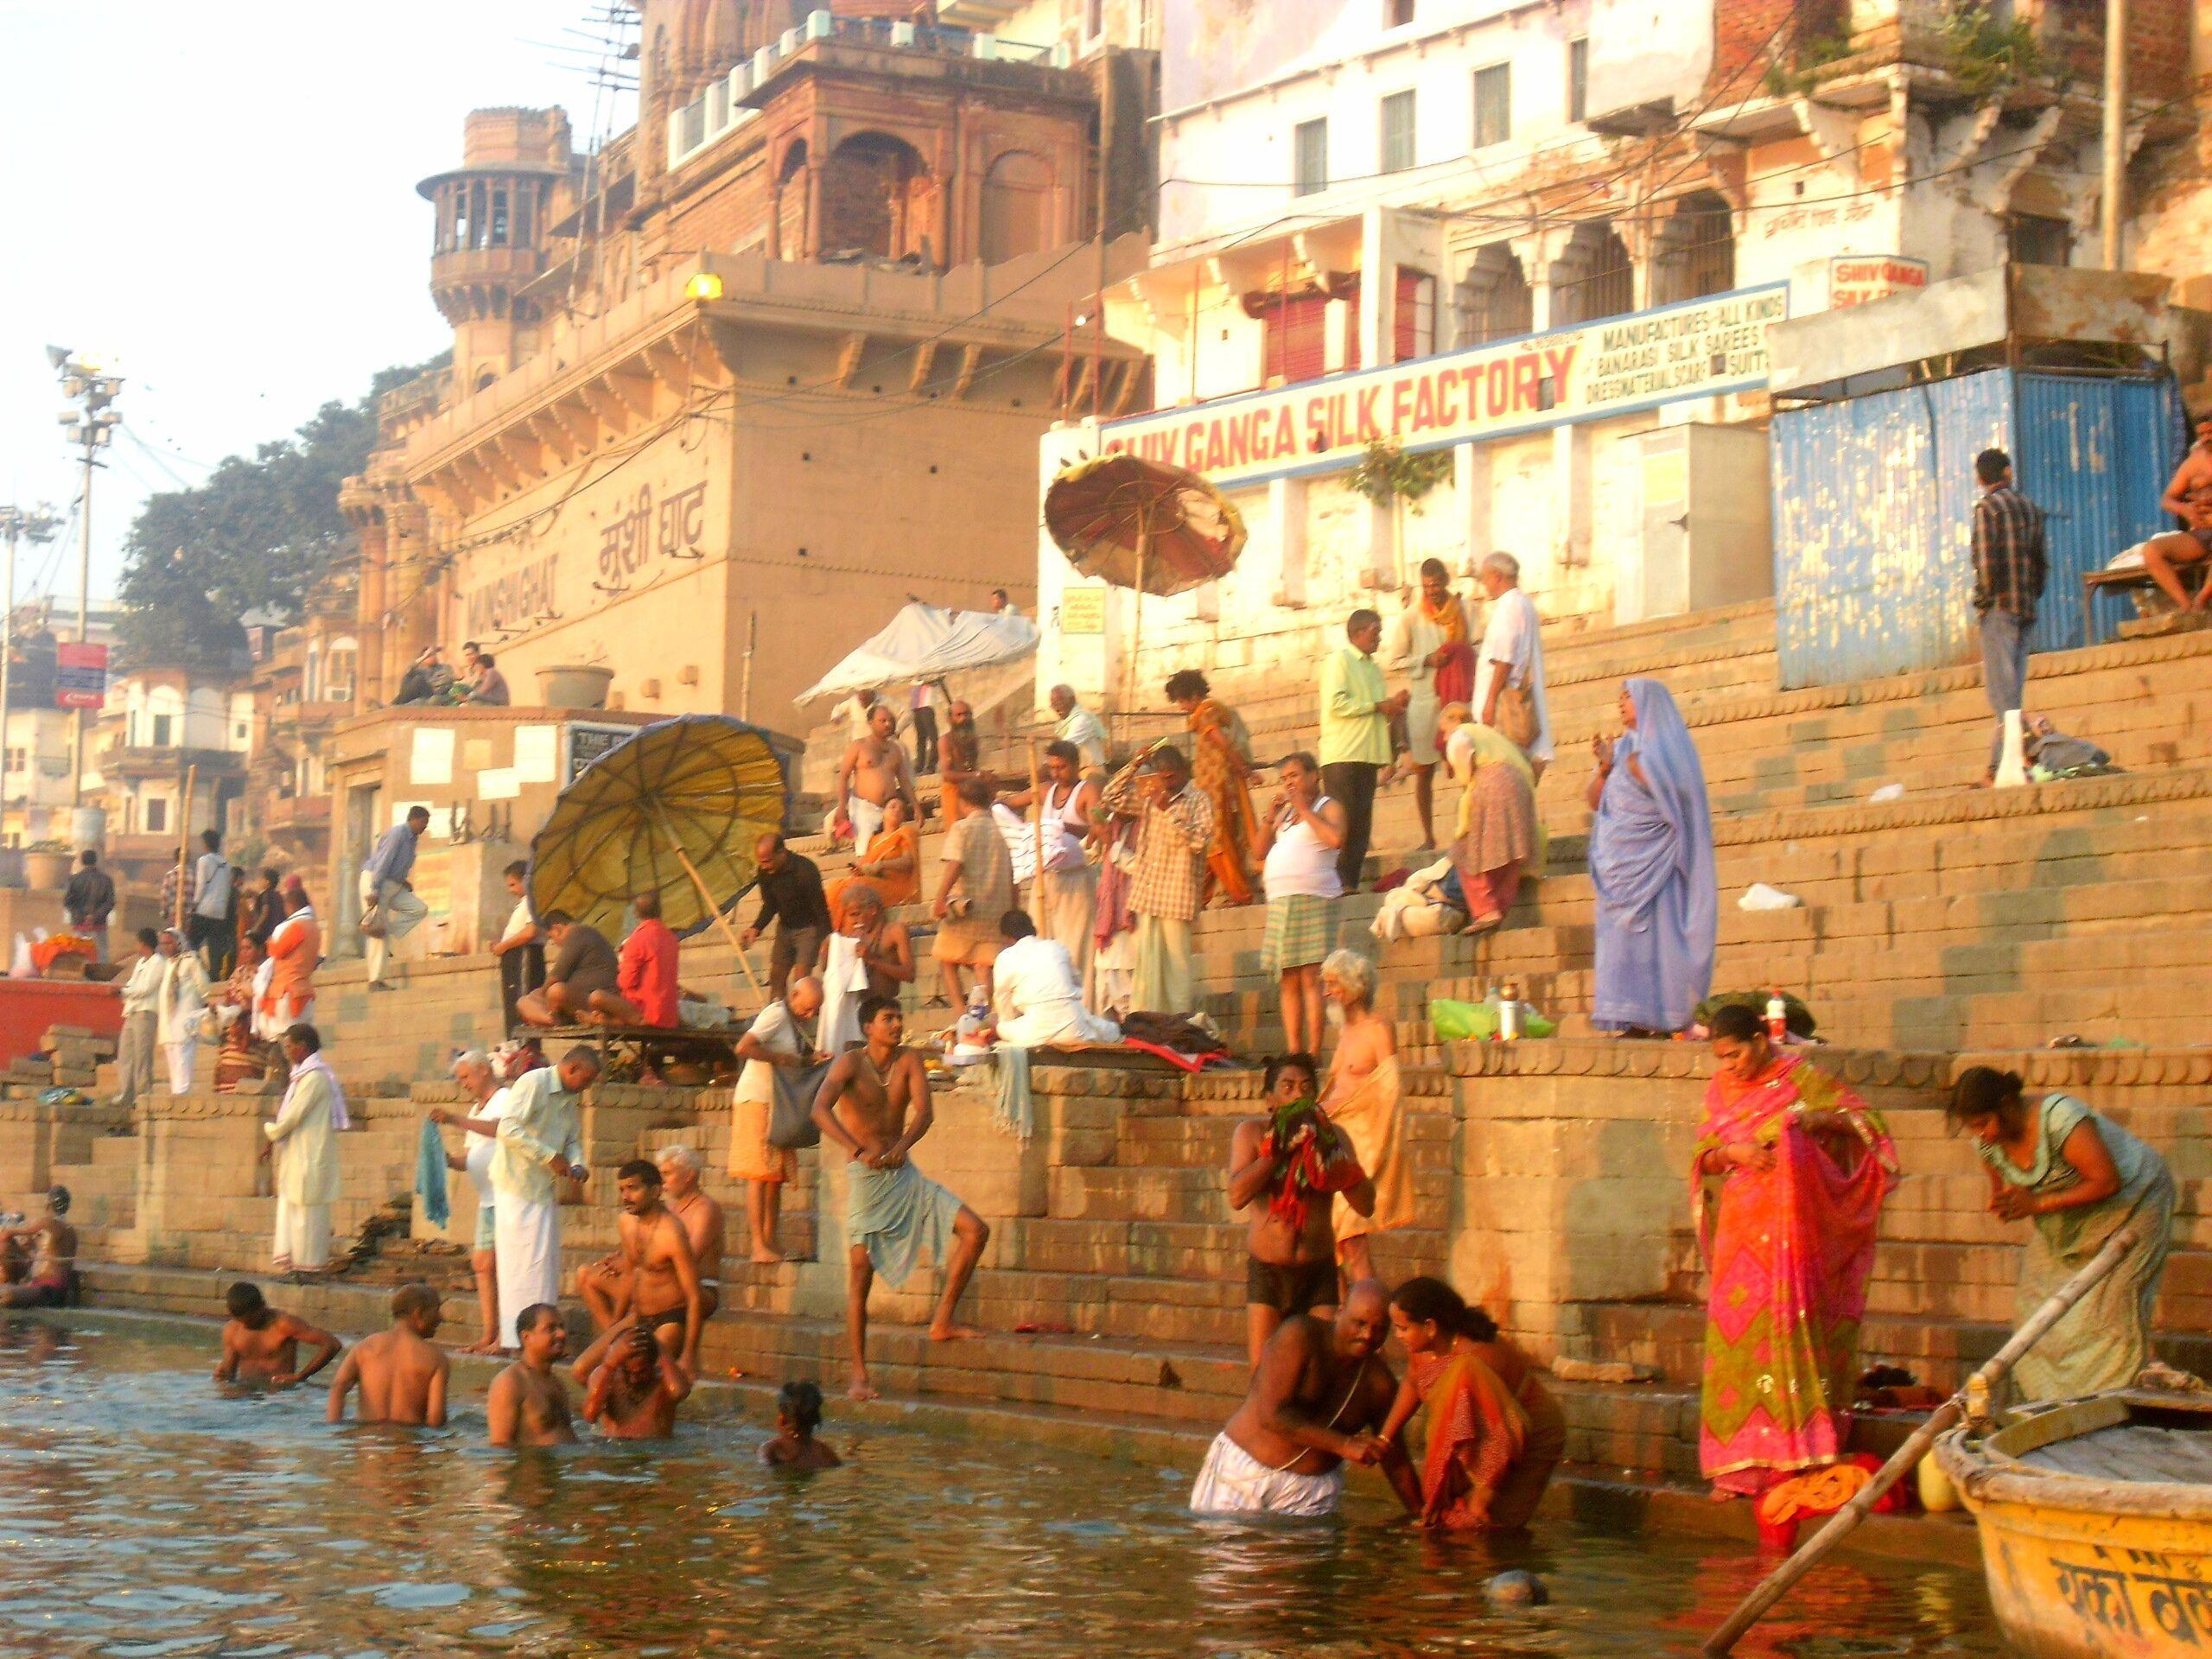 India - Haz La Mochila